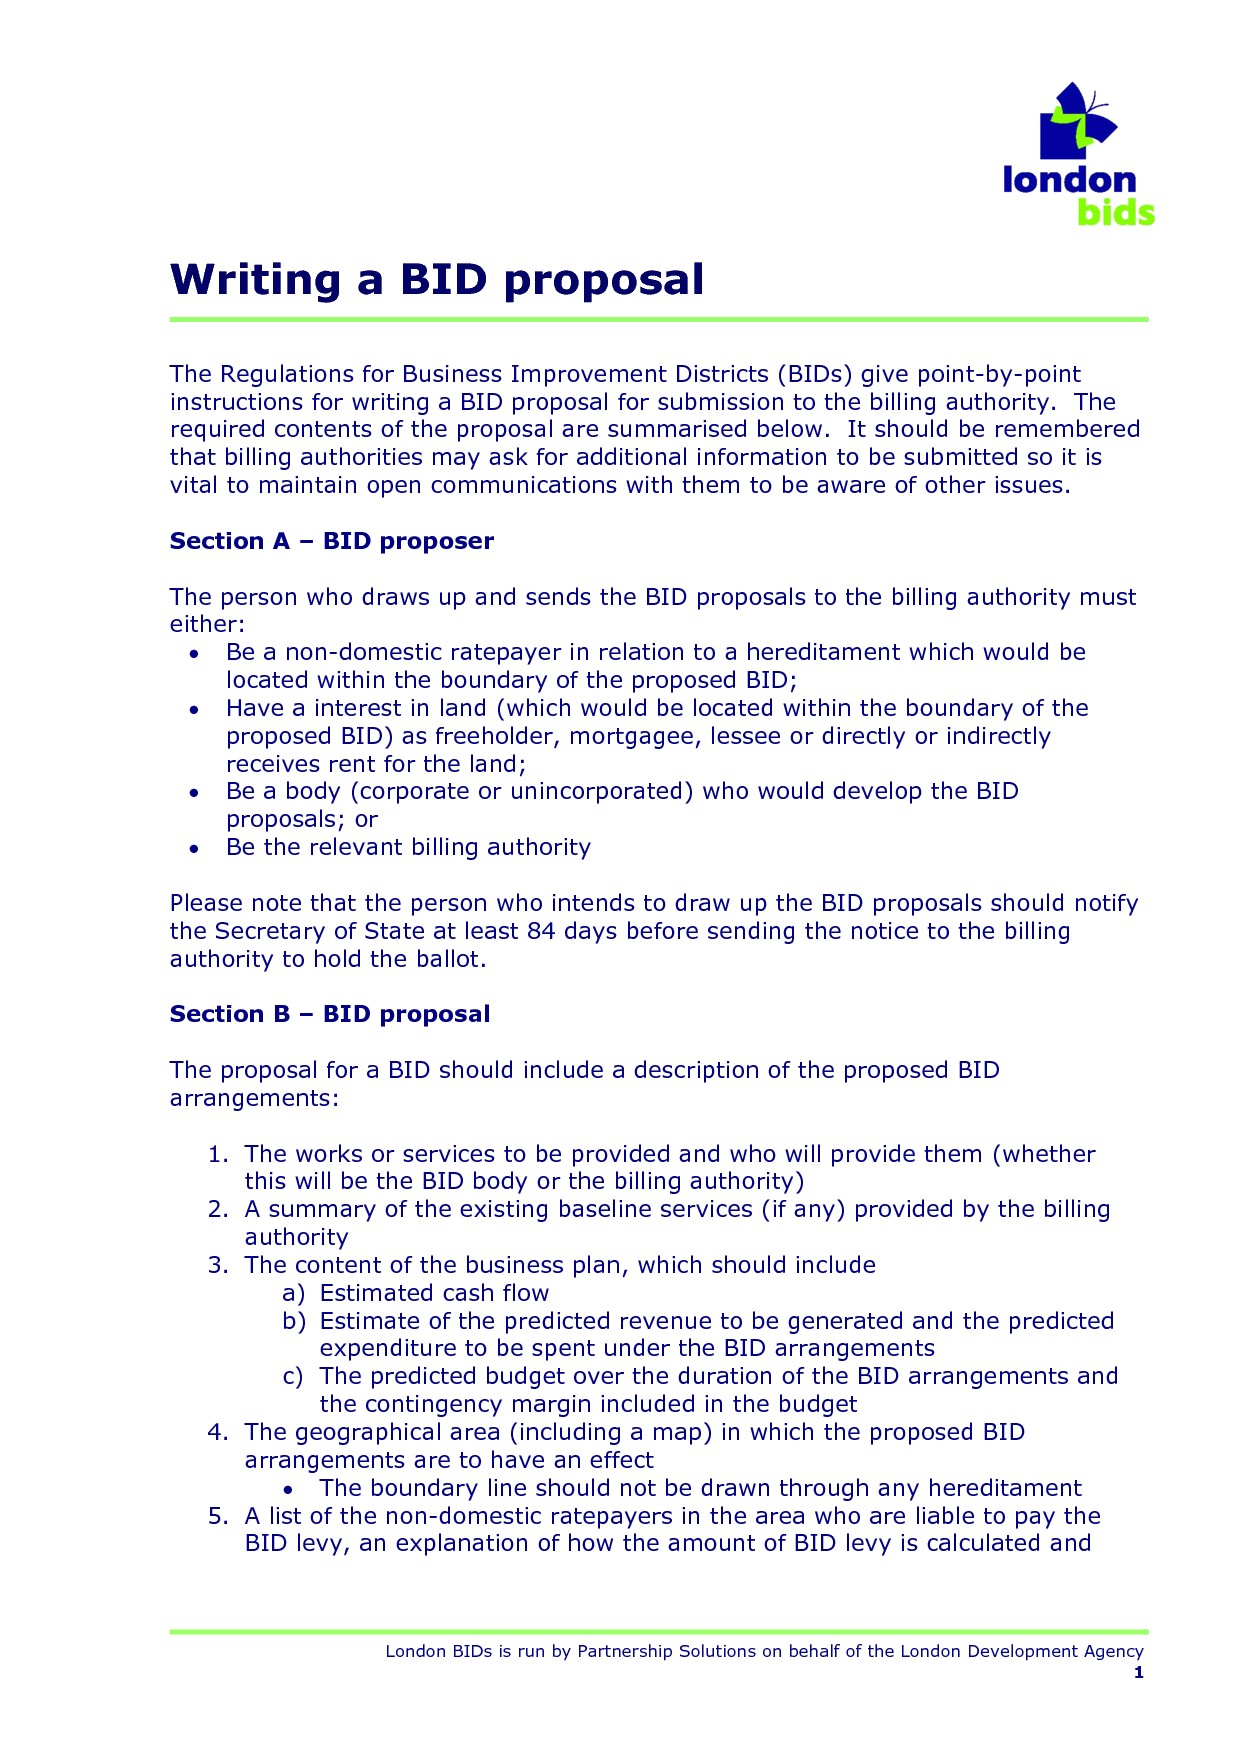 5 sample bid proposal